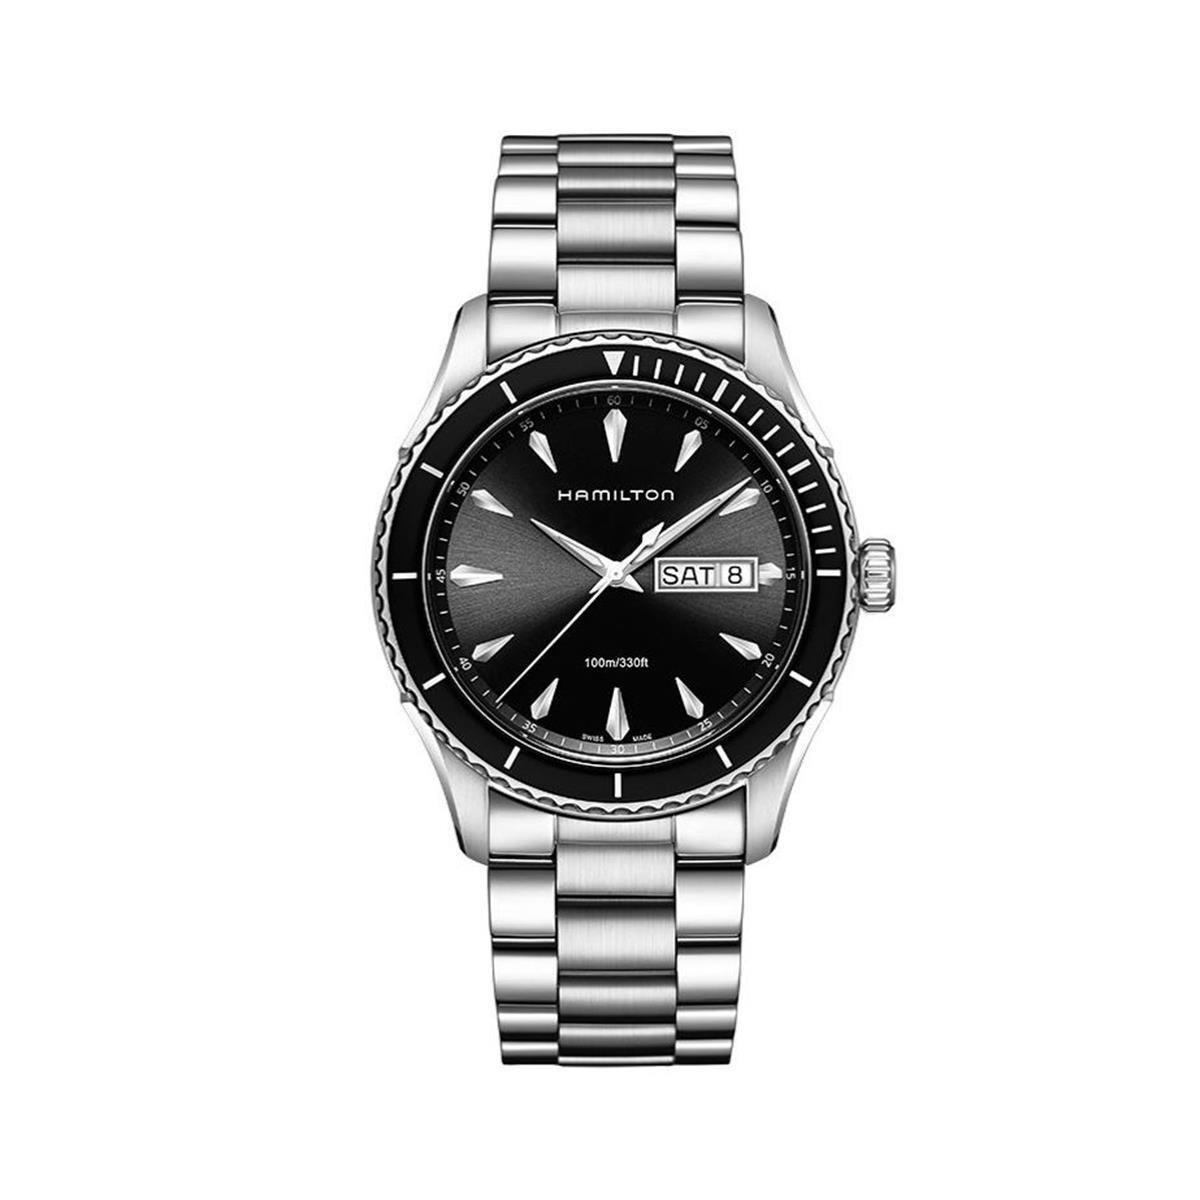 Hamilton Men's Analogue Quartz Watch with Stainless Steel Strap H37511131